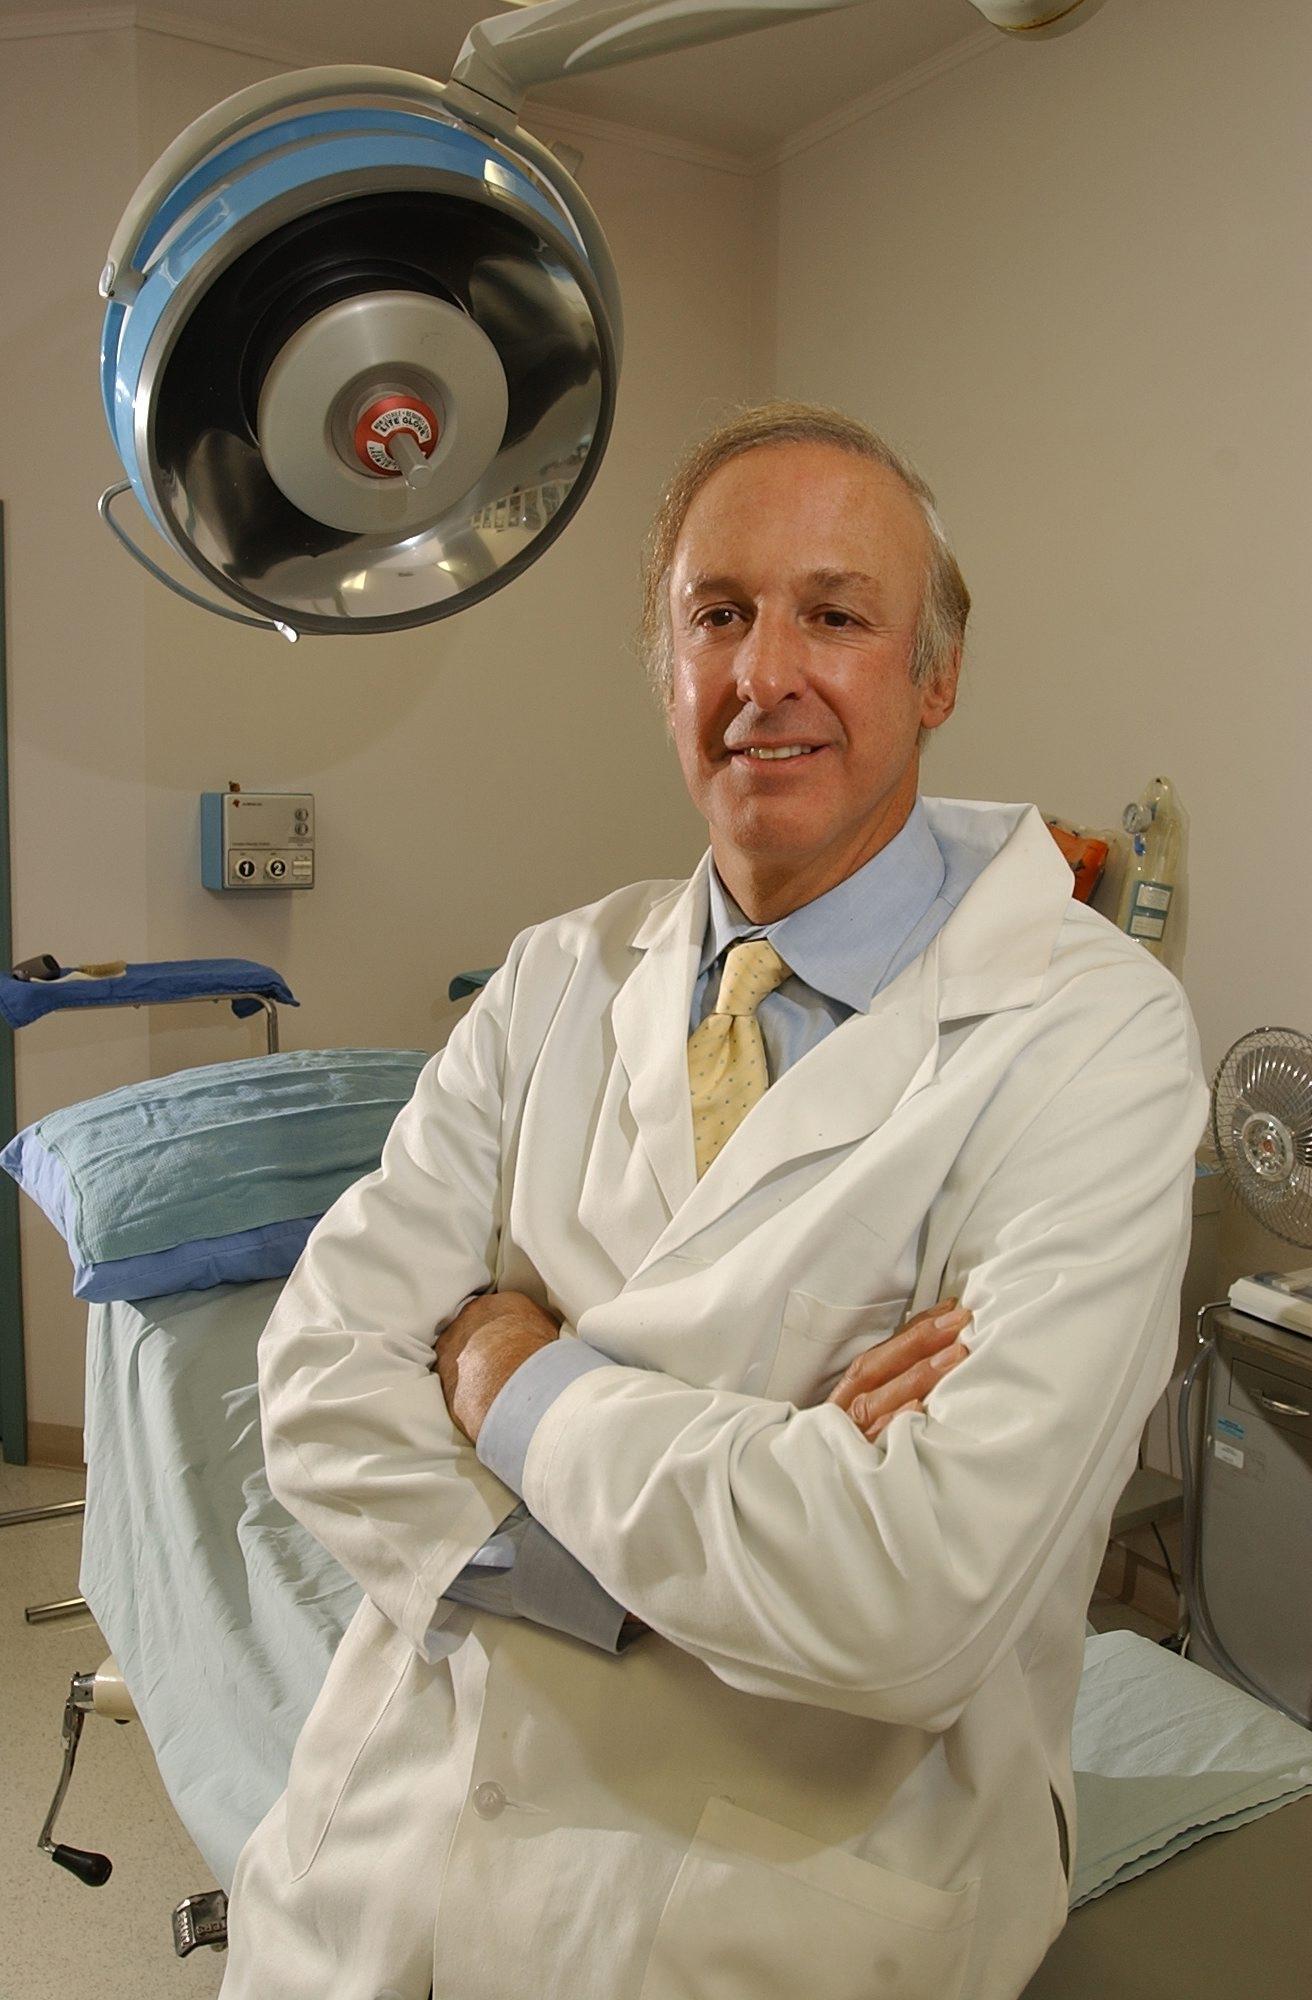 Dr. Jeffrey G. Meilman says Davis R. Tiburzi has not repaid $1.